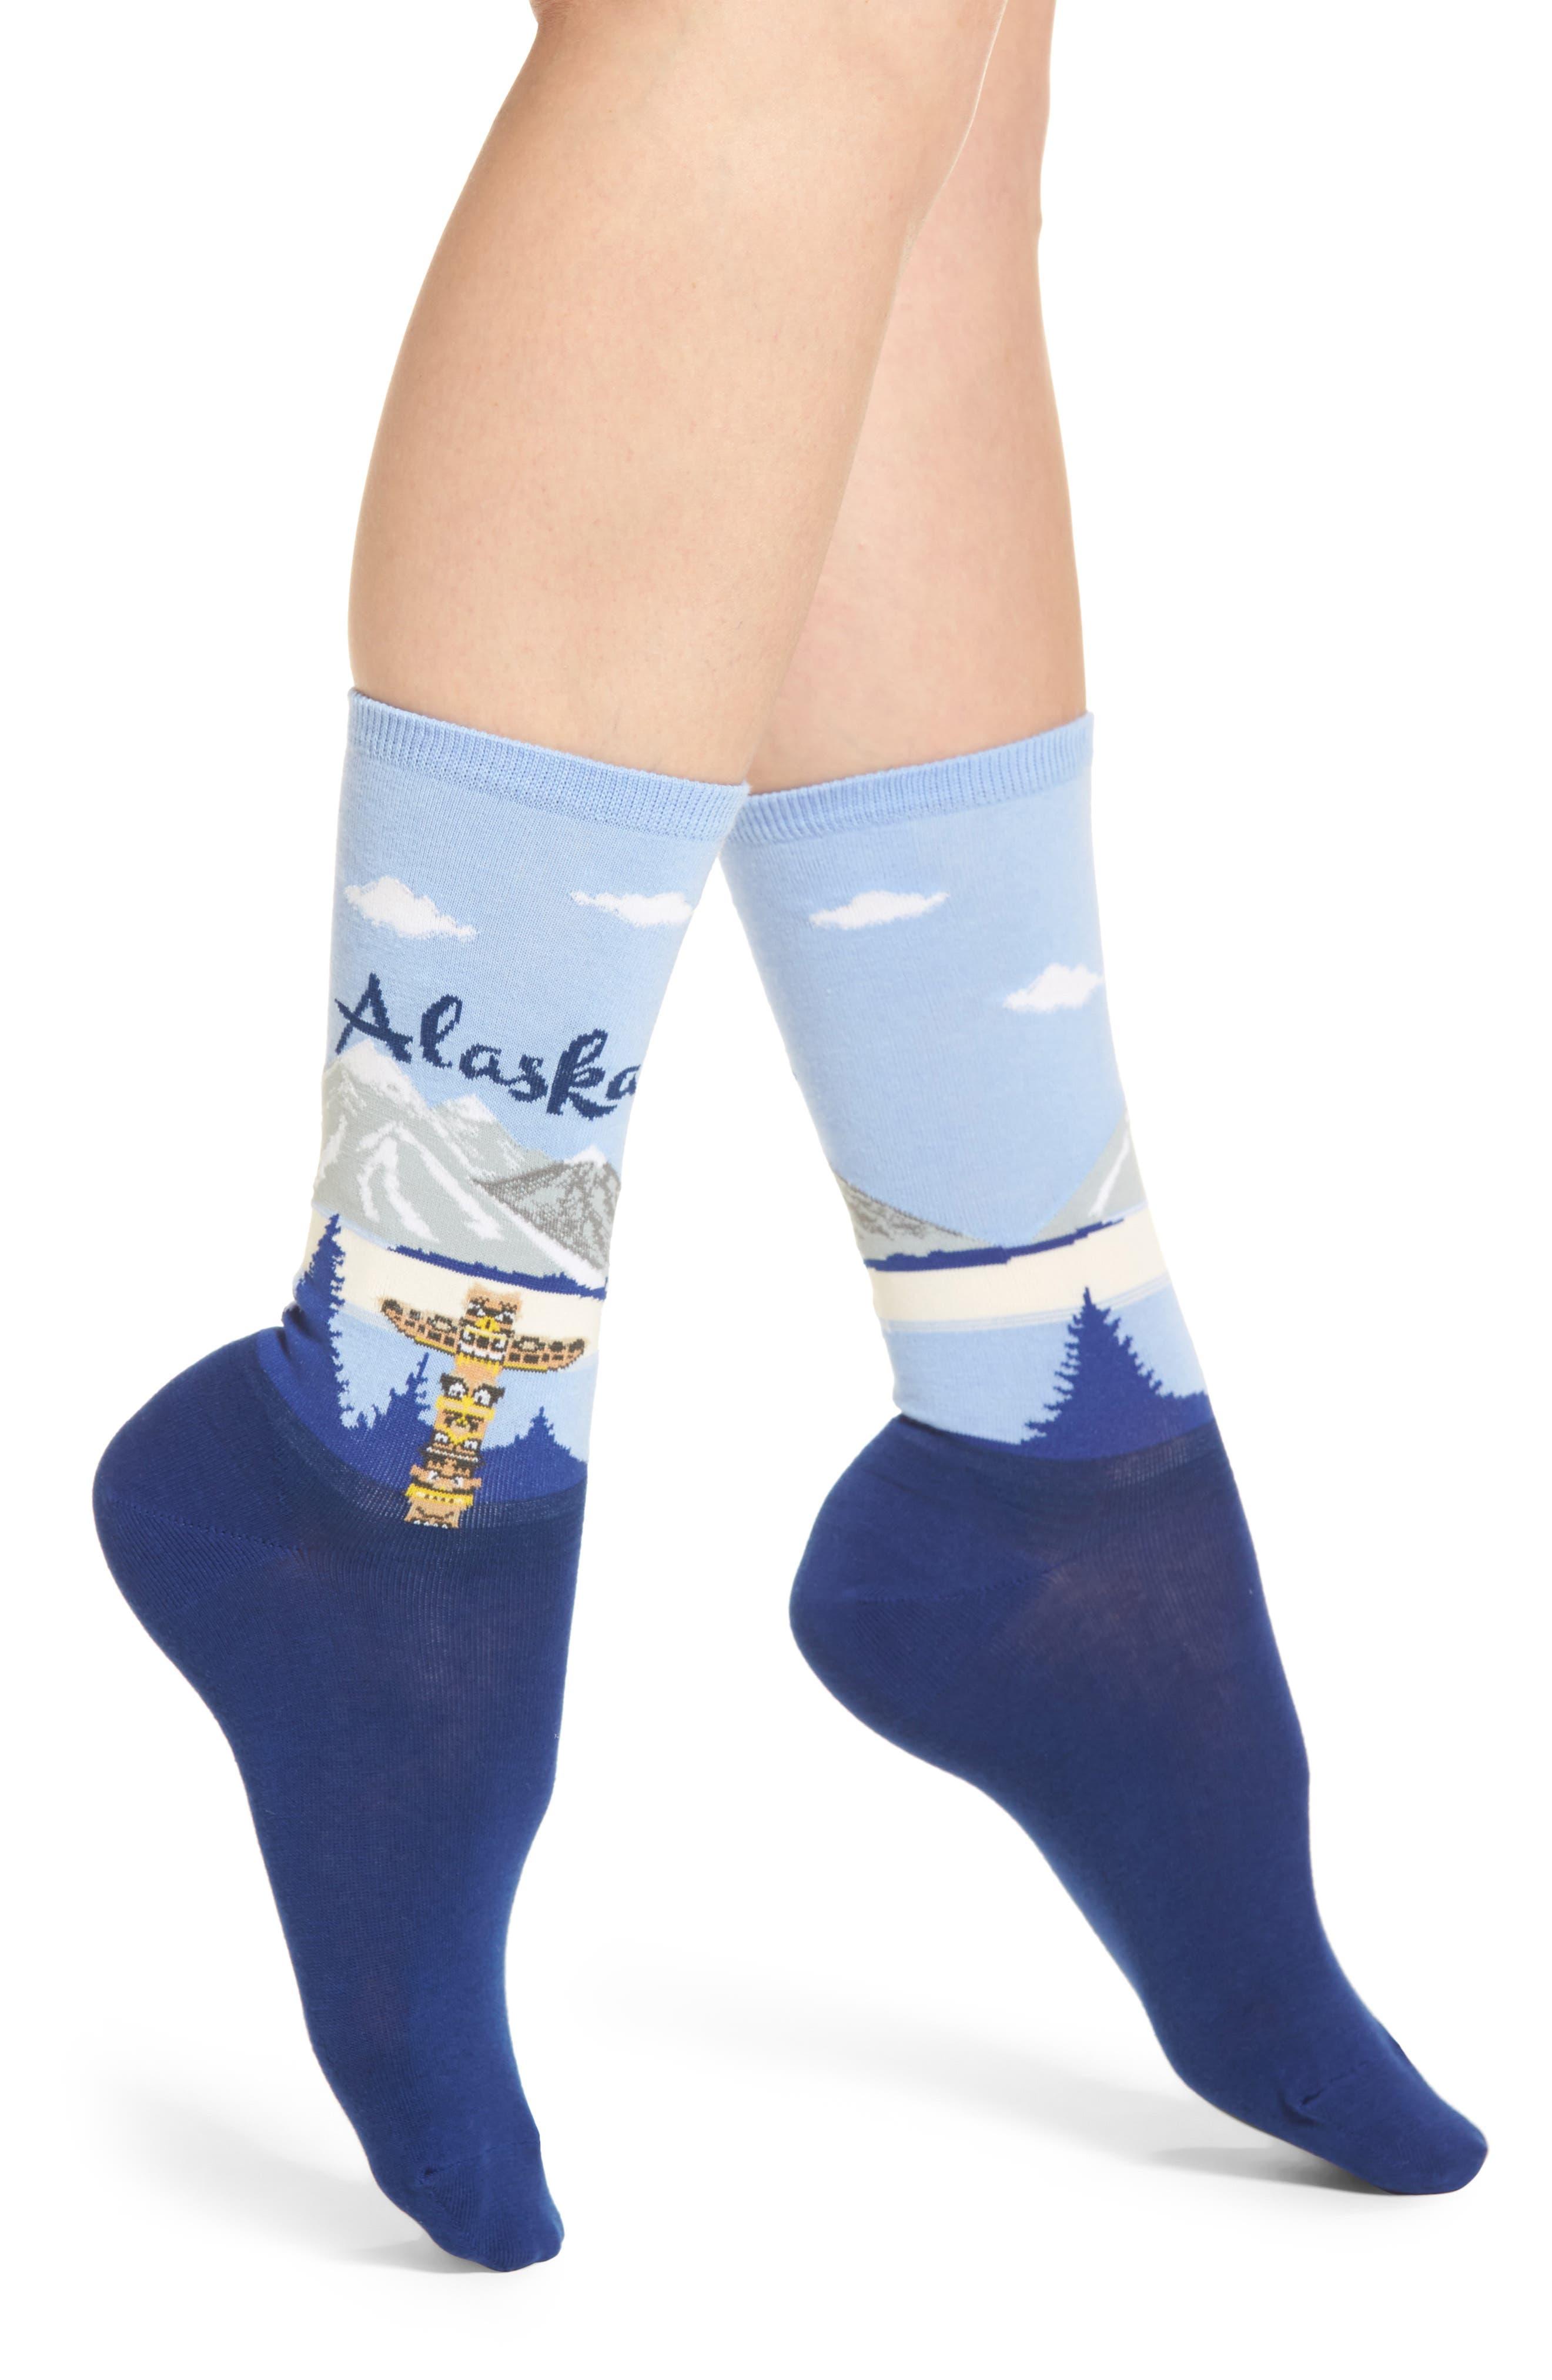 Travel Series - Alaska Crew Socks,                             Main thumbnail 1, color,                             439